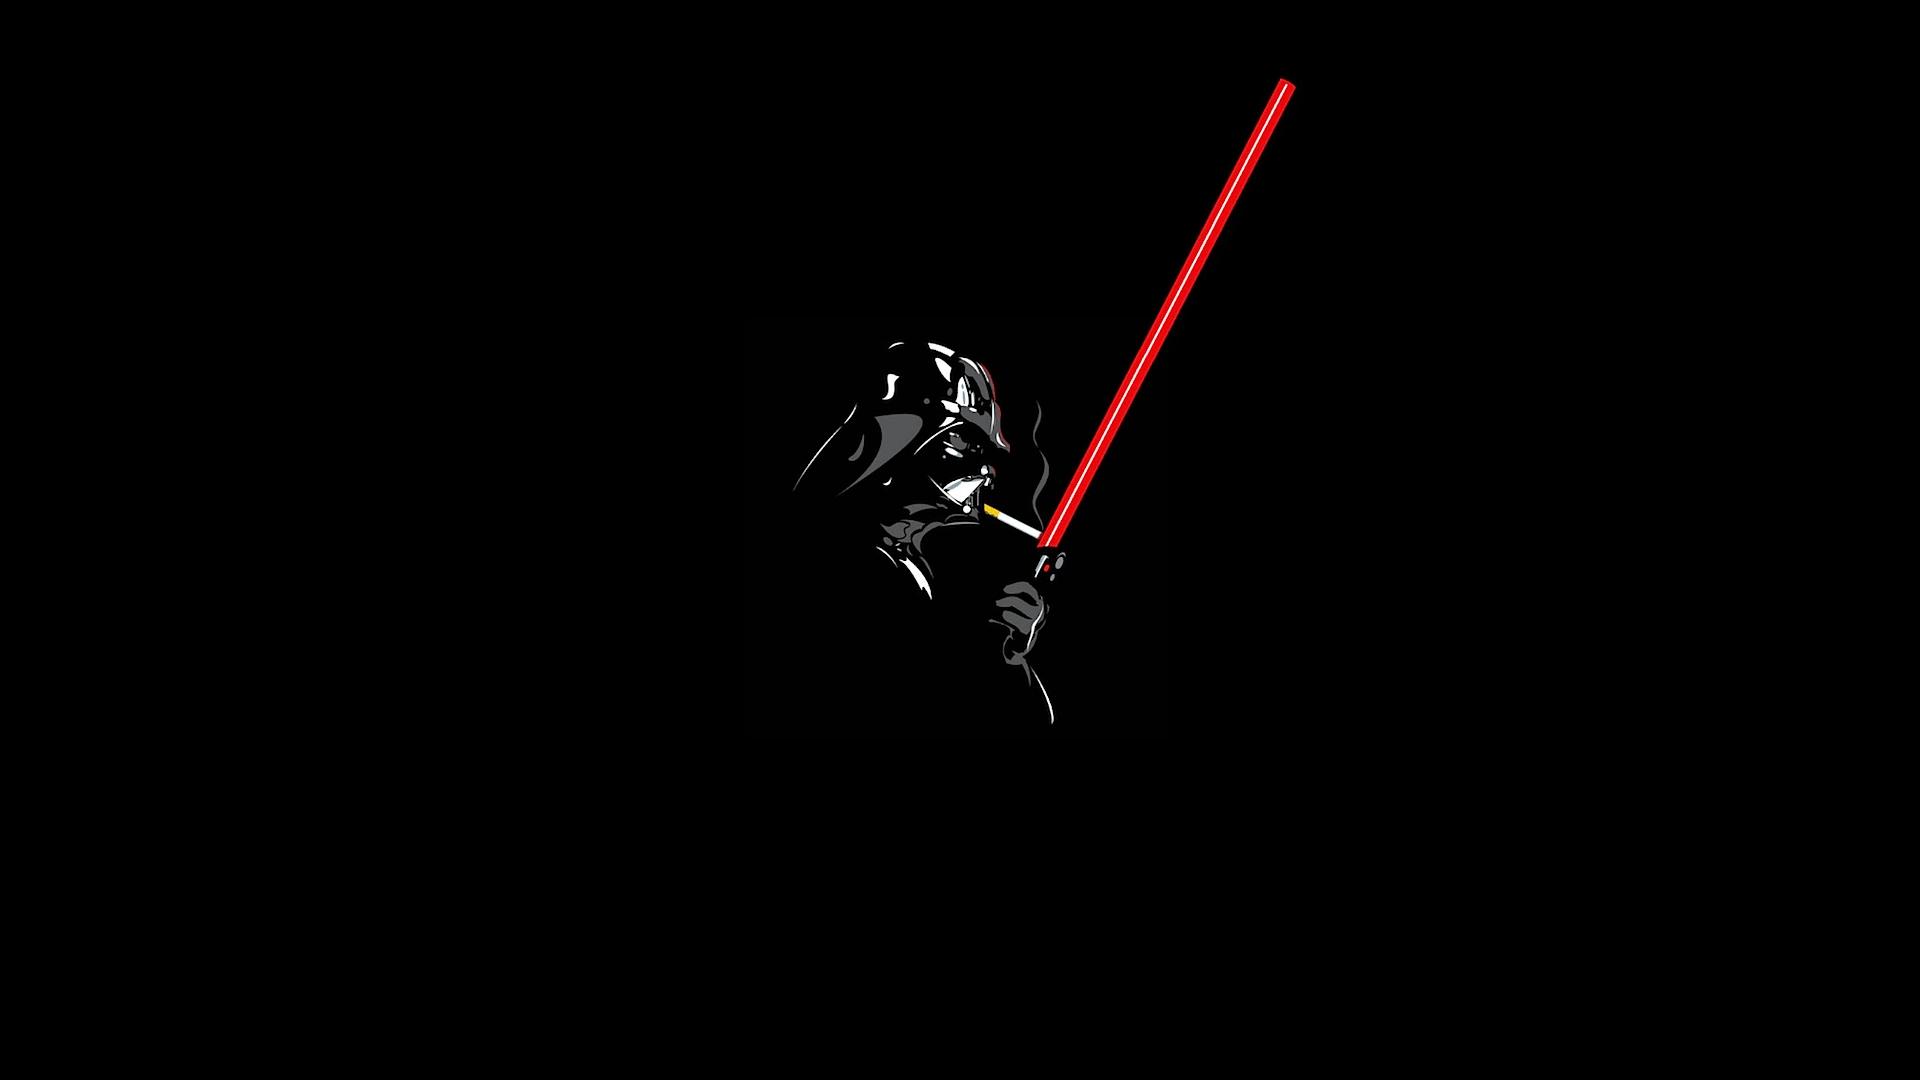 epic star wars trooper wallpaper - photo #23